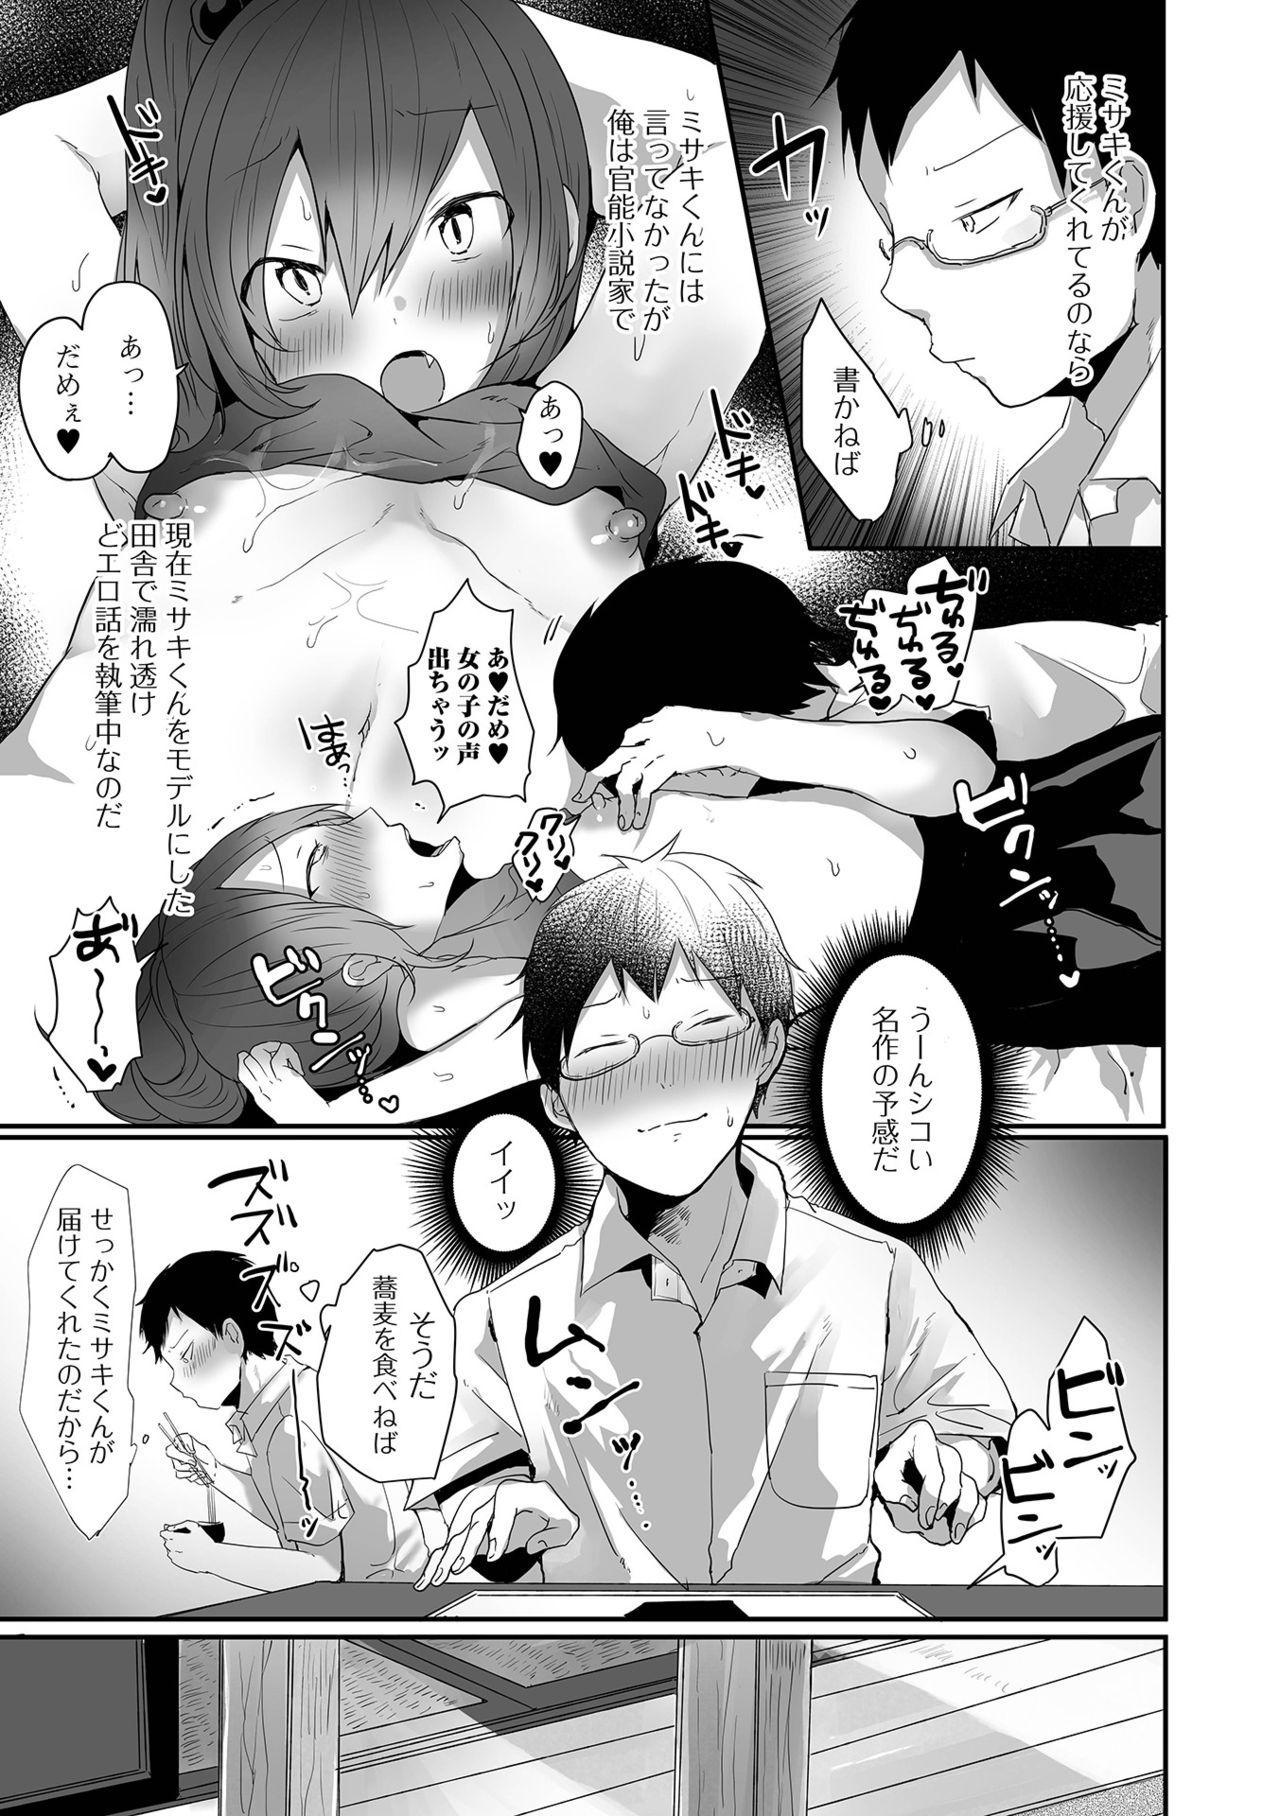 Gekkan Web Otoko no Ko-llection! S Vol. 64 20